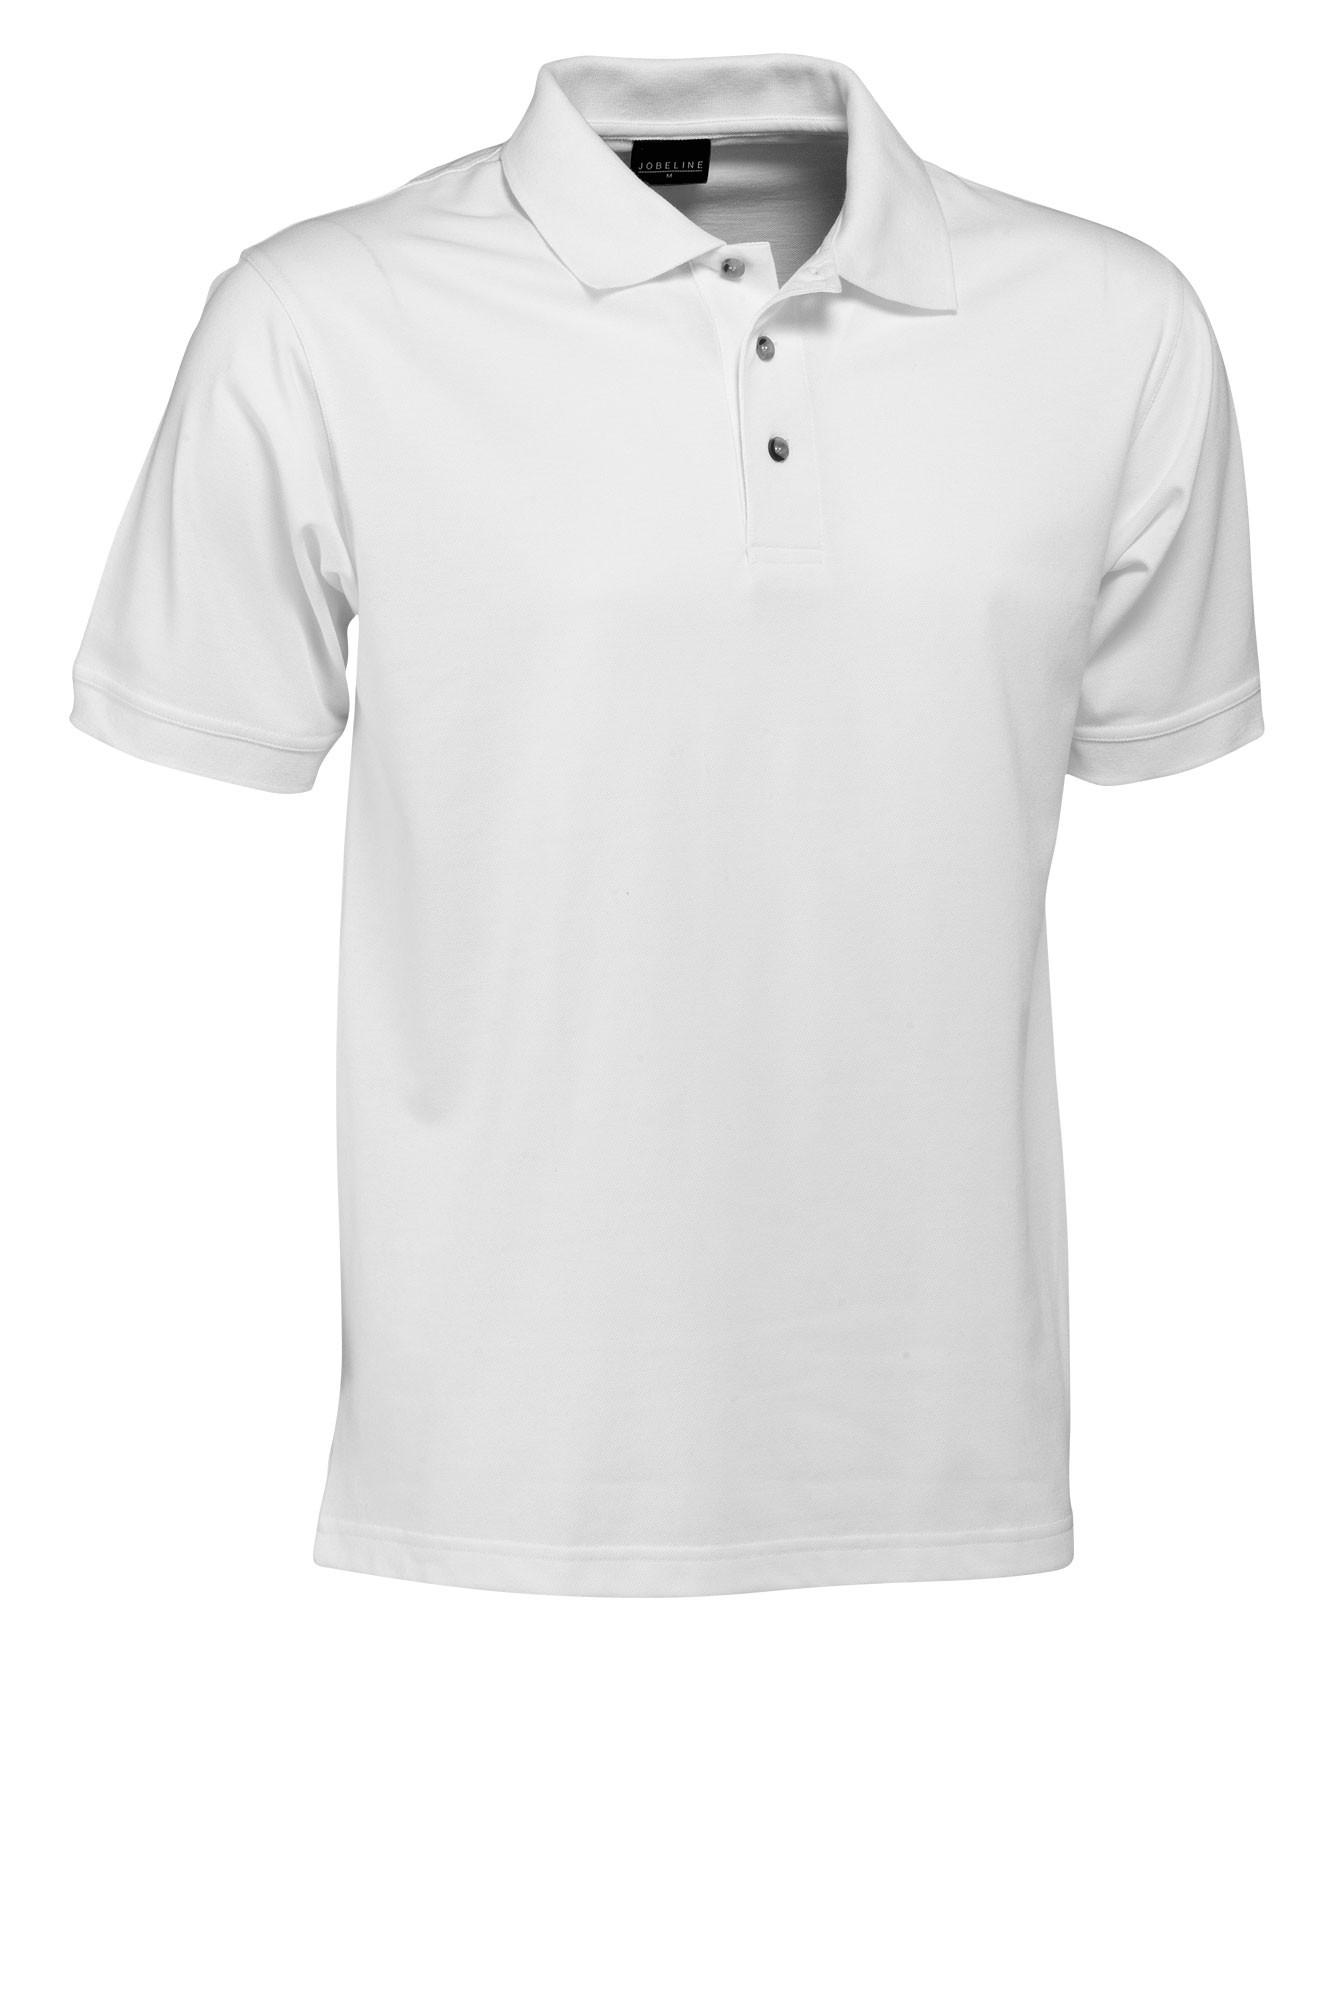 Pánské tričko Fly - bílá